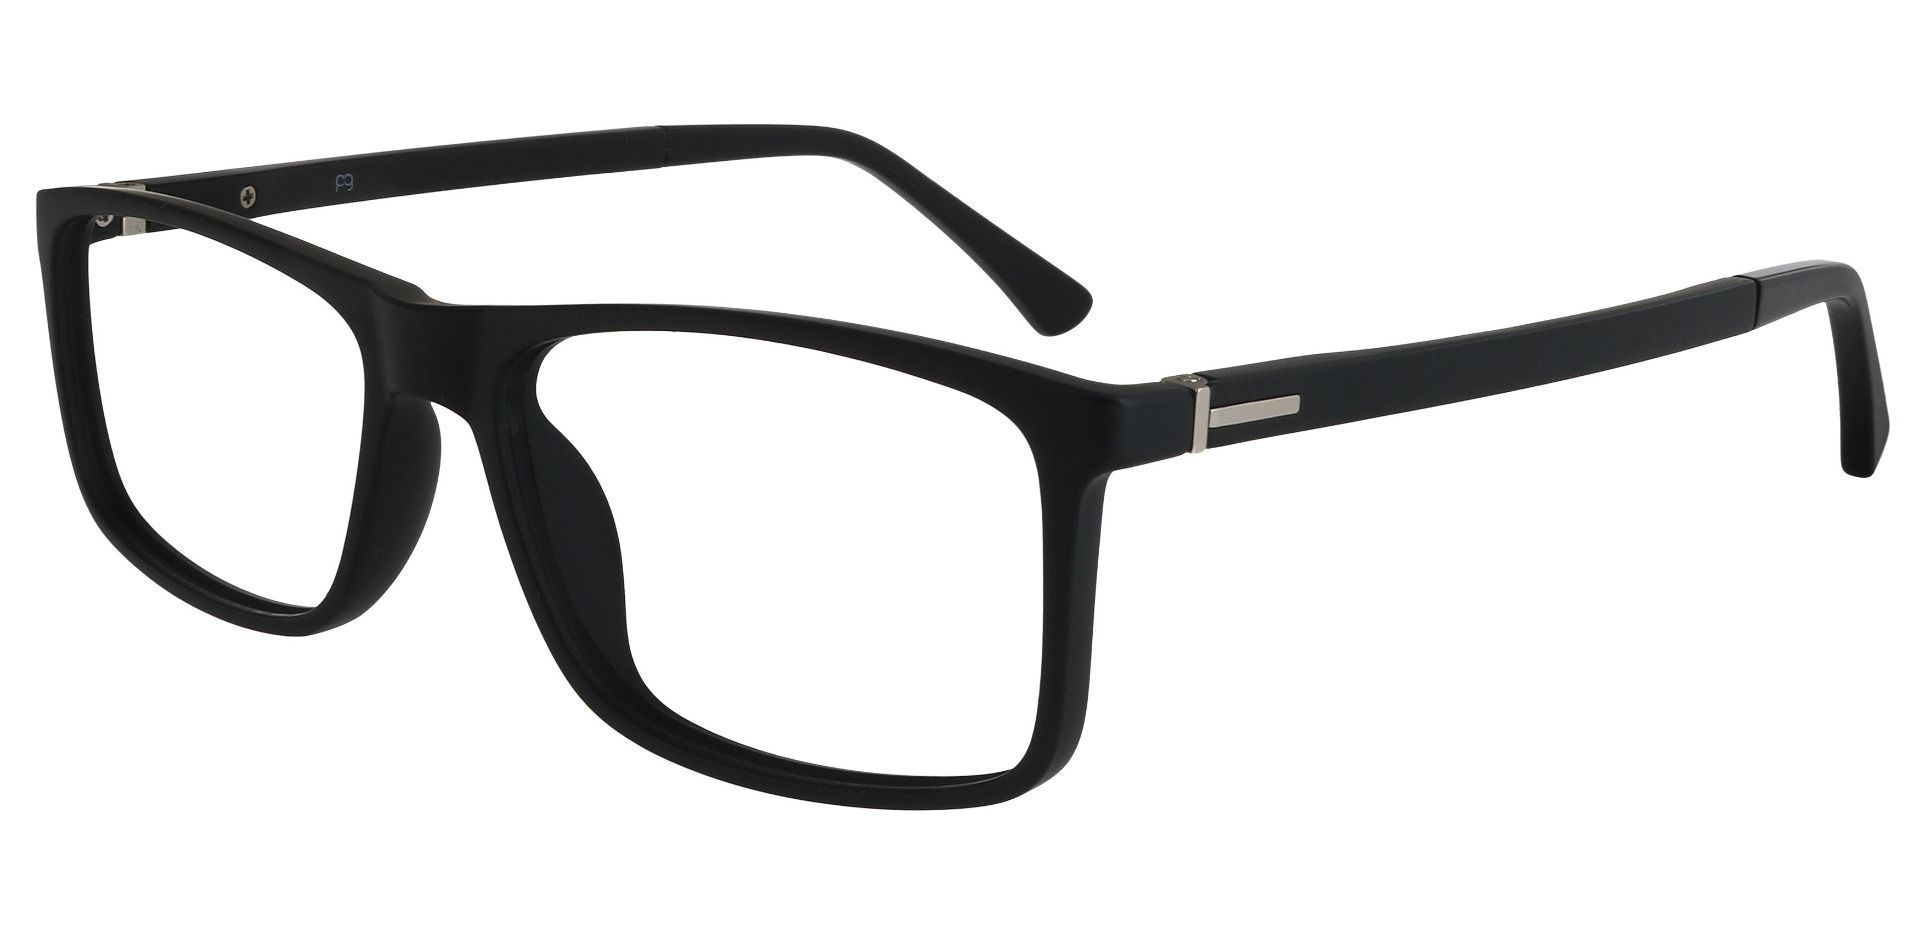 Montana Rectangle Prescription Glasses - Matte Black